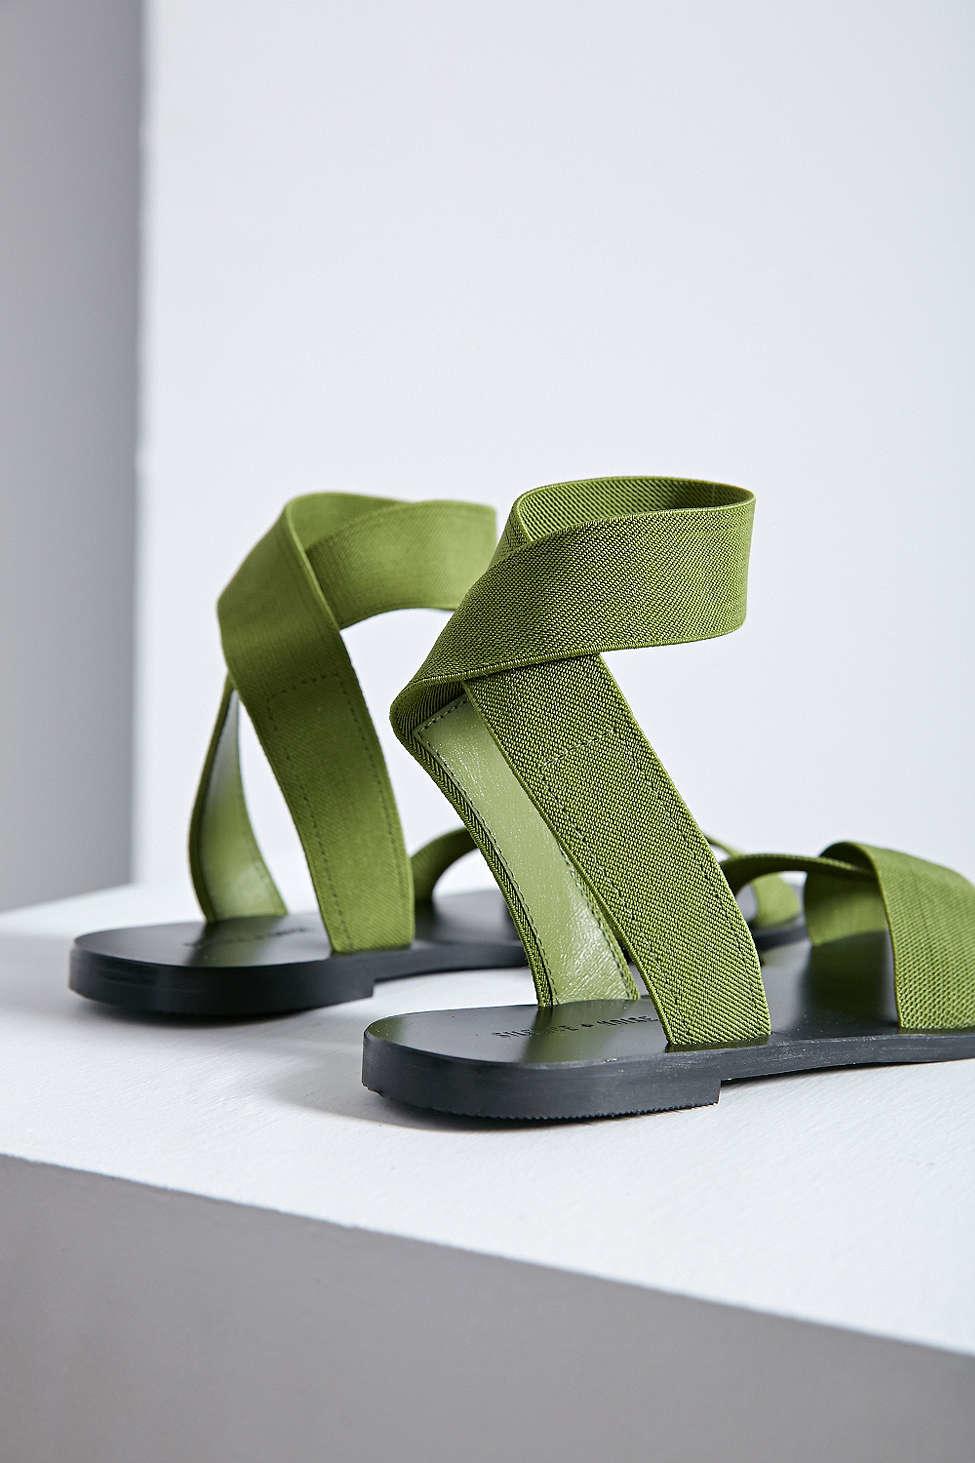 c90de0eee4c Lyst - Silence + Noise Alexa Elastic Sandal in Green